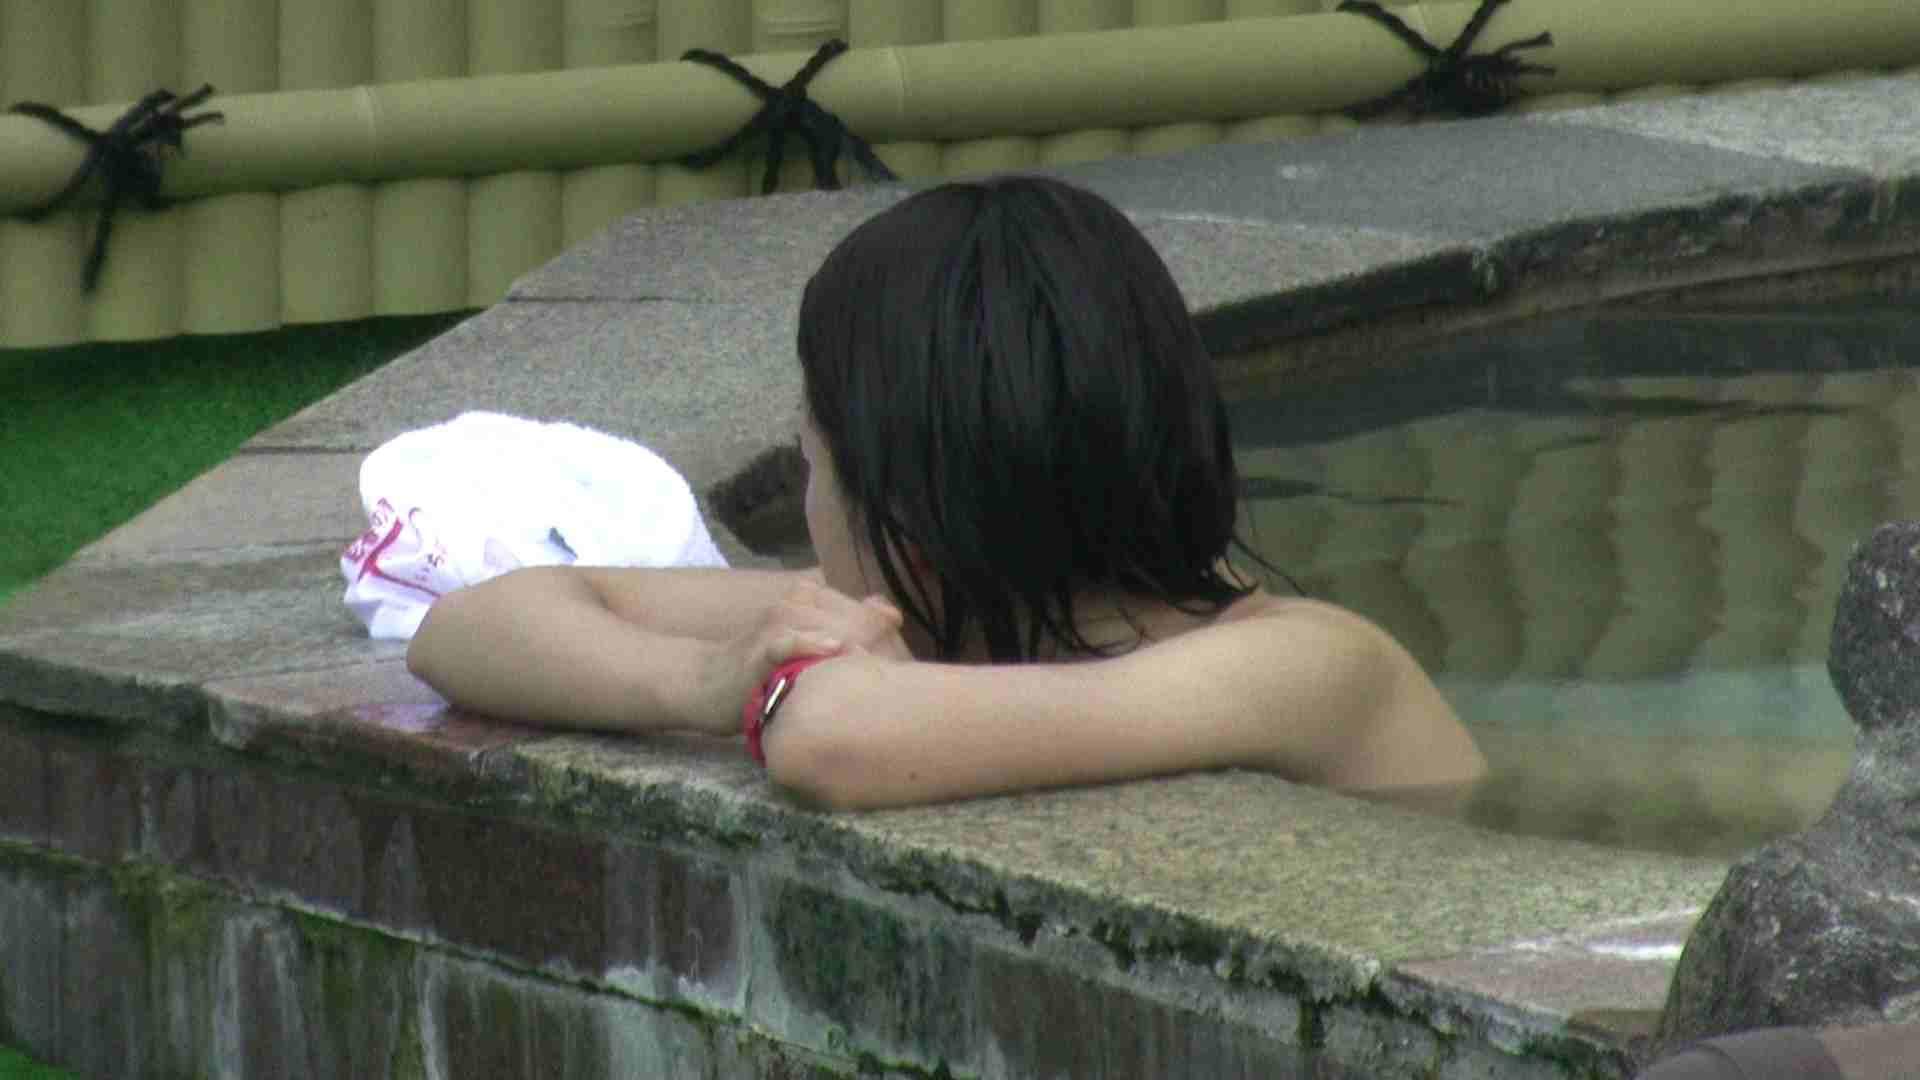 Aquaな露天風呂Vol.133 0 | 0  46連発 21